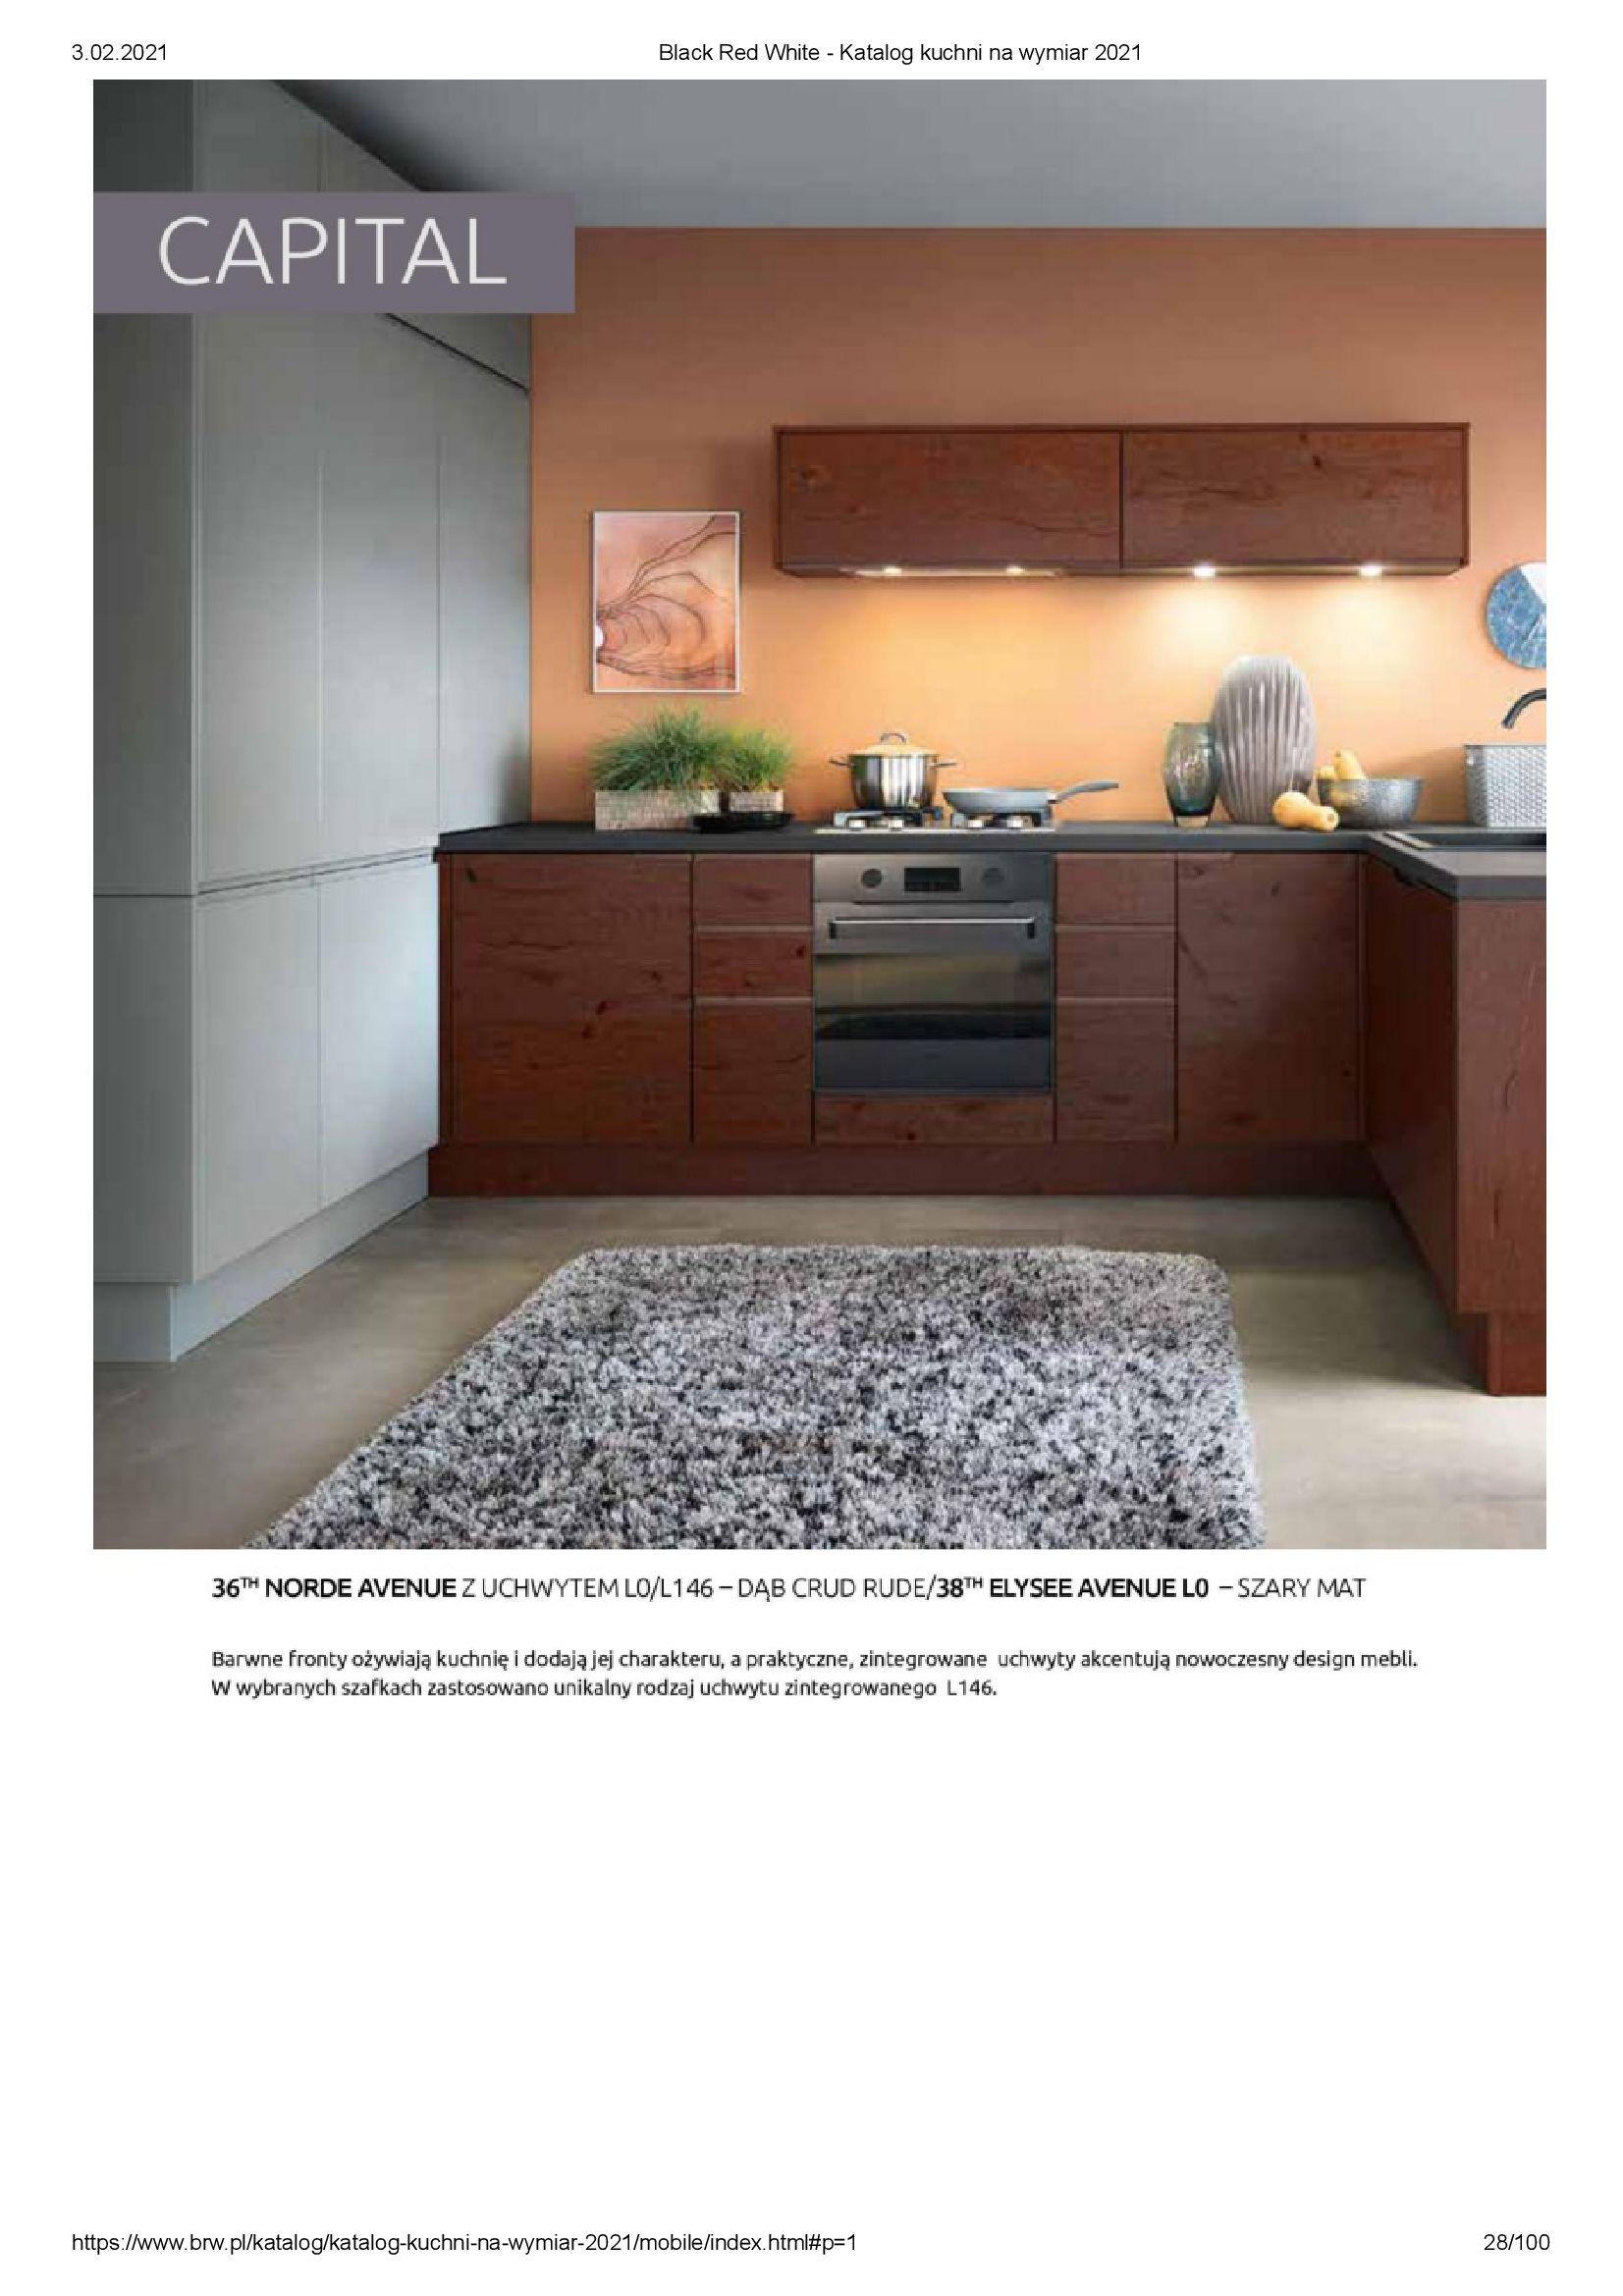 Gazetka Black Red White: Katalog - Kuchnie na wymiar Senso Kitchens 2021 2021-01-01 page-28